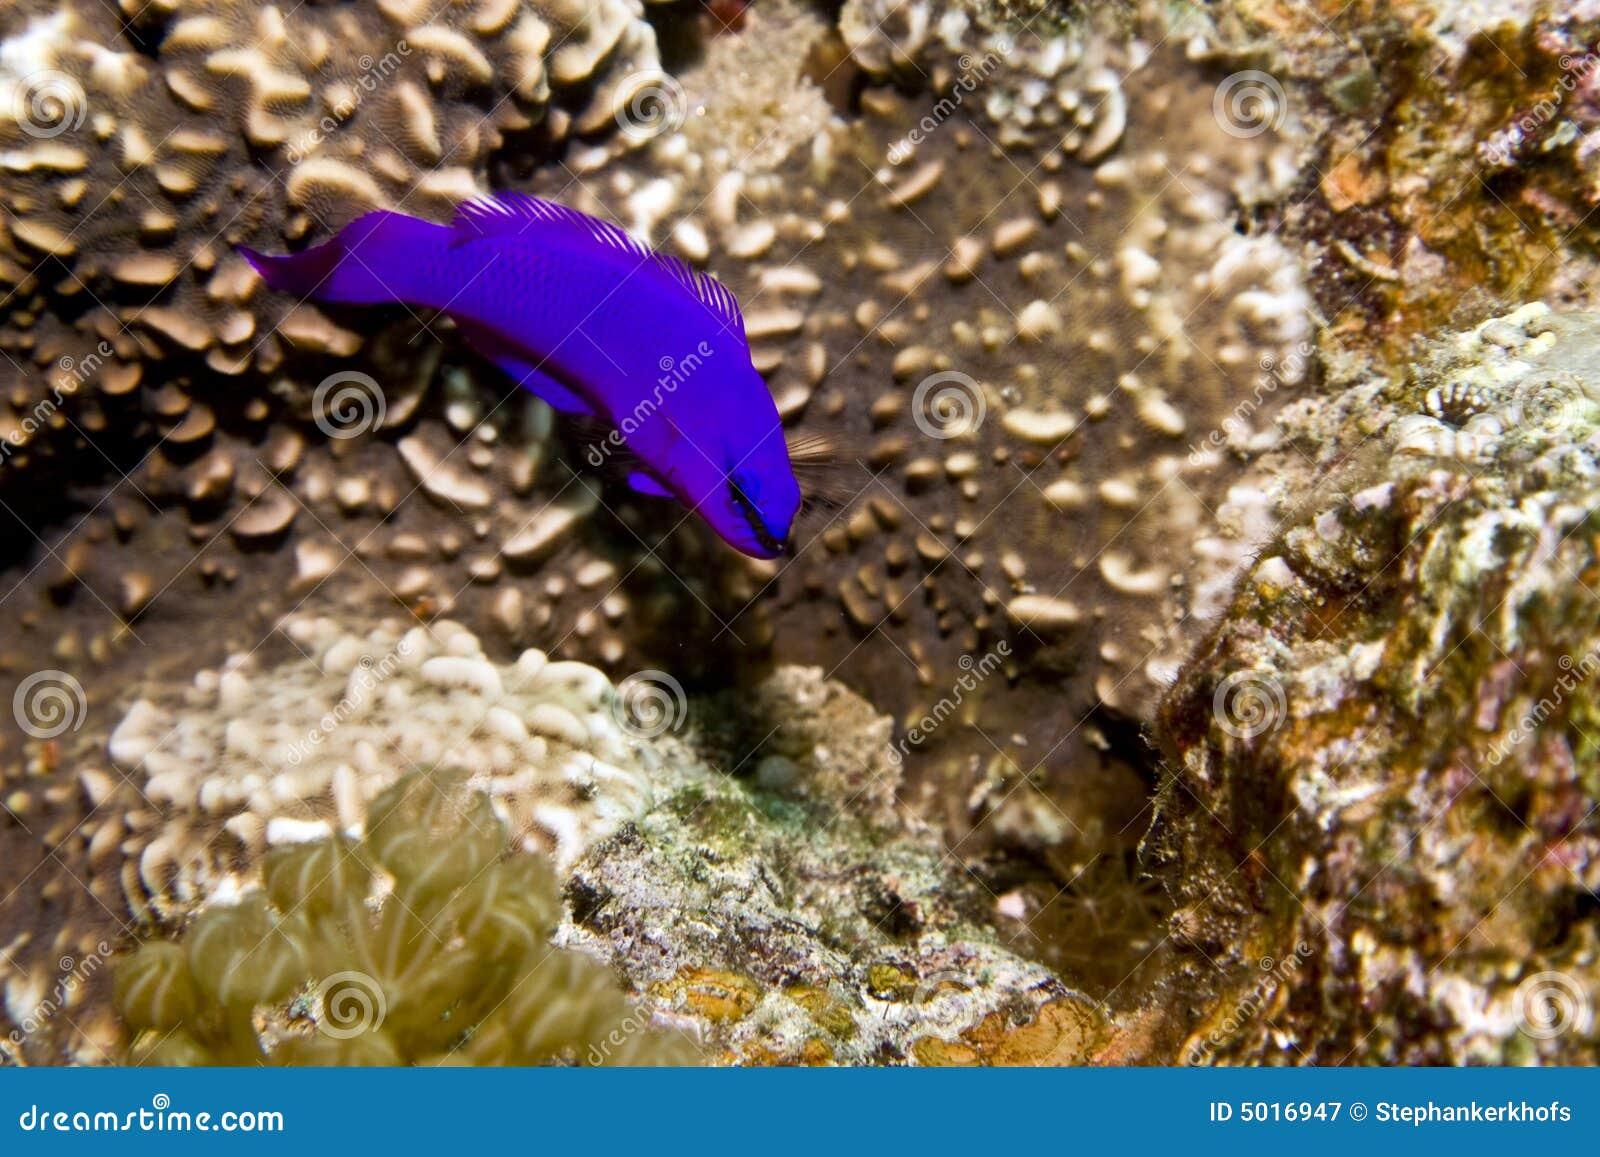 Orchidee dottyback (pseudochromis fridmani)